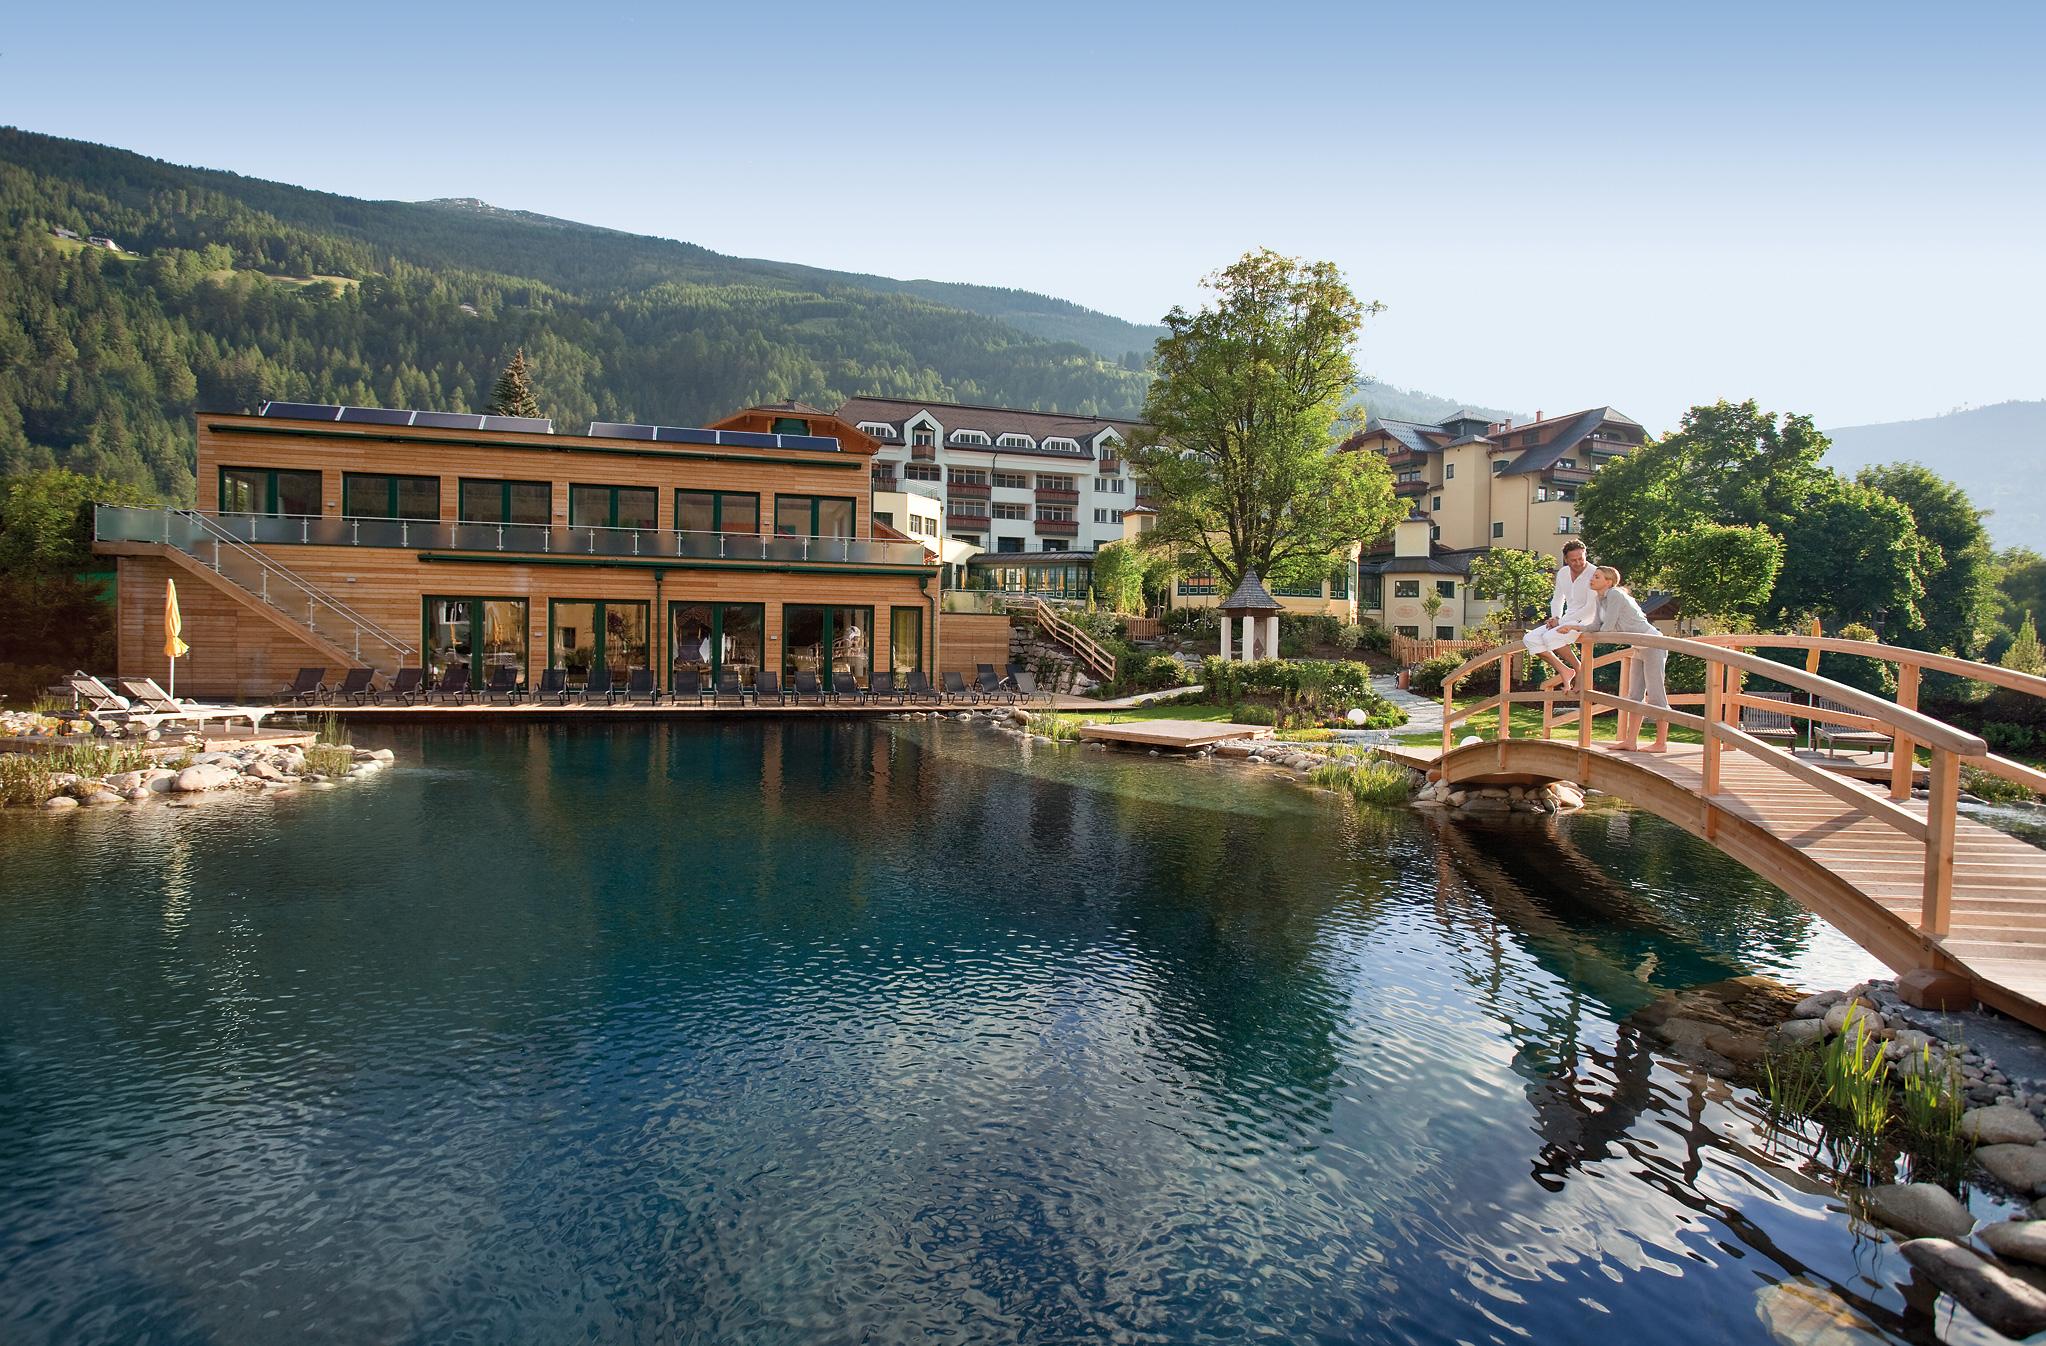 Hotel Engel Resort And Spa